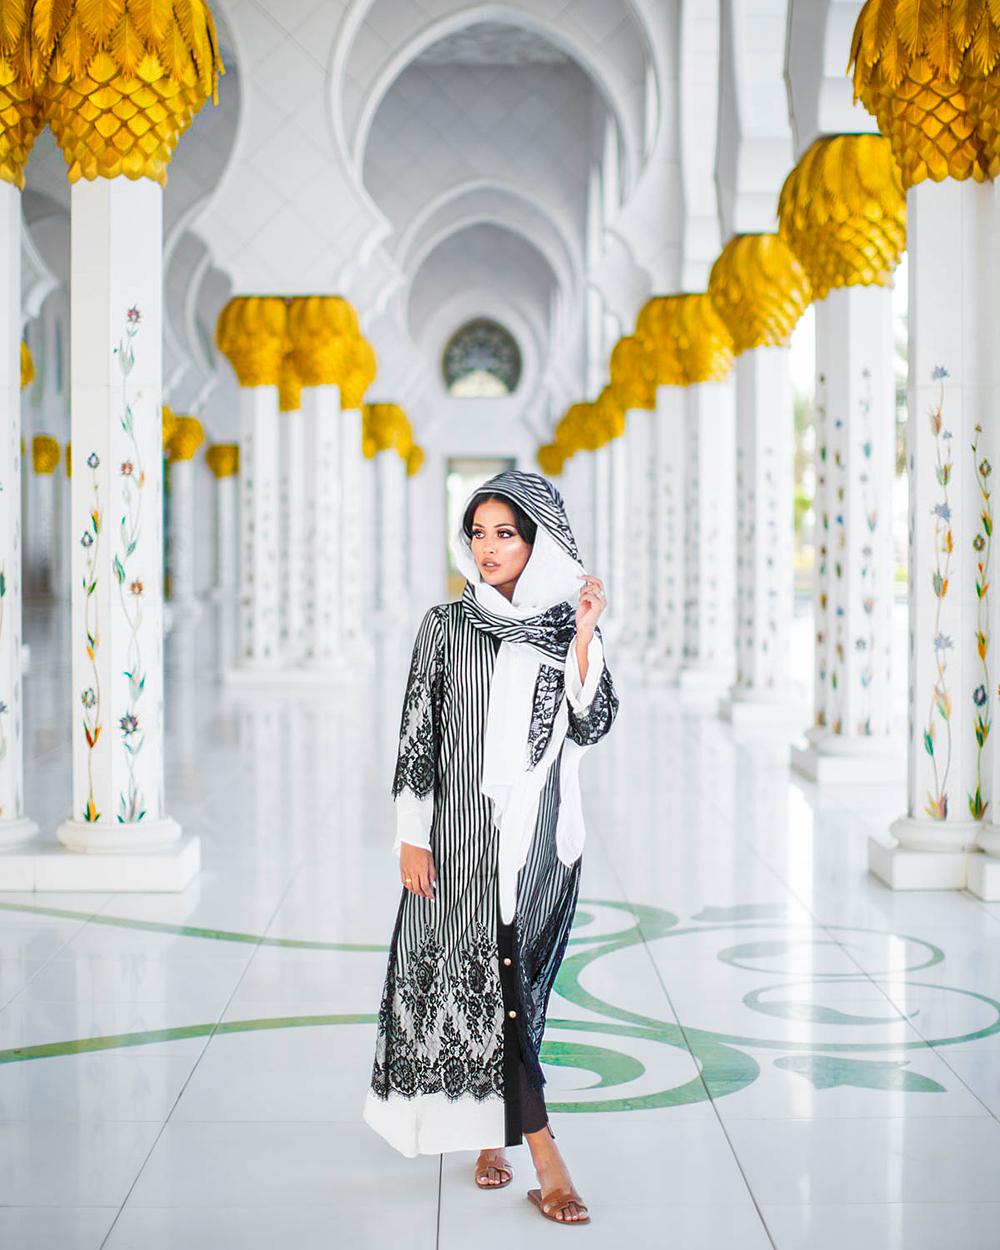 sheikh-zayed-mosque-abu-dhabi-2